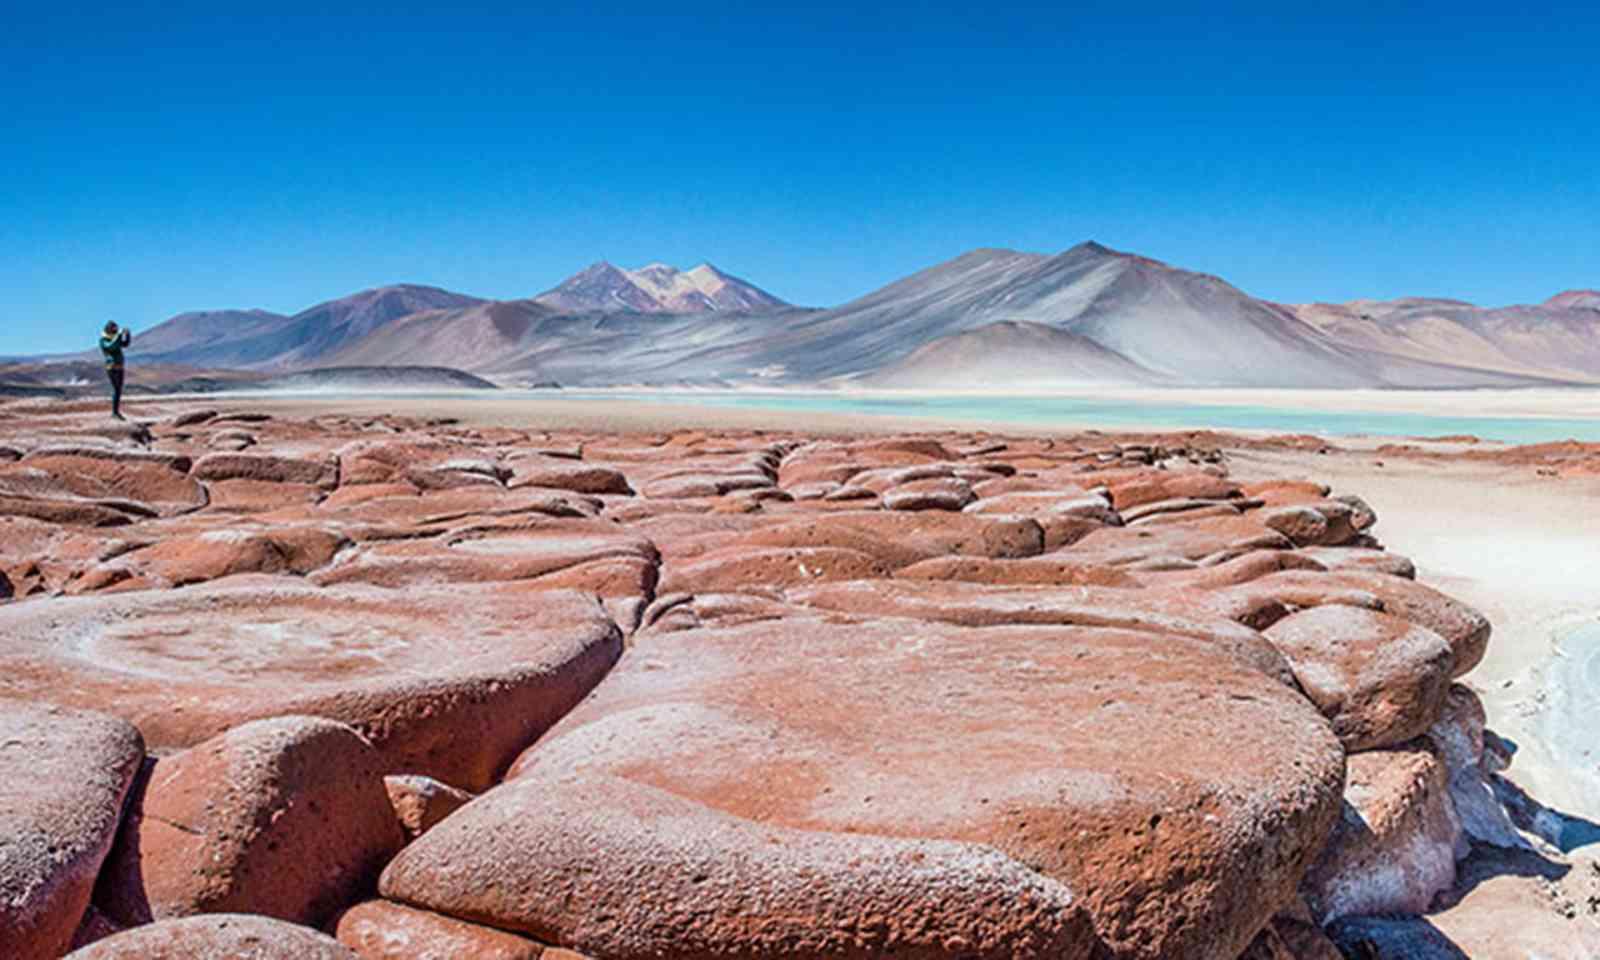 San Pedro de Atacama (Jason Spafford)